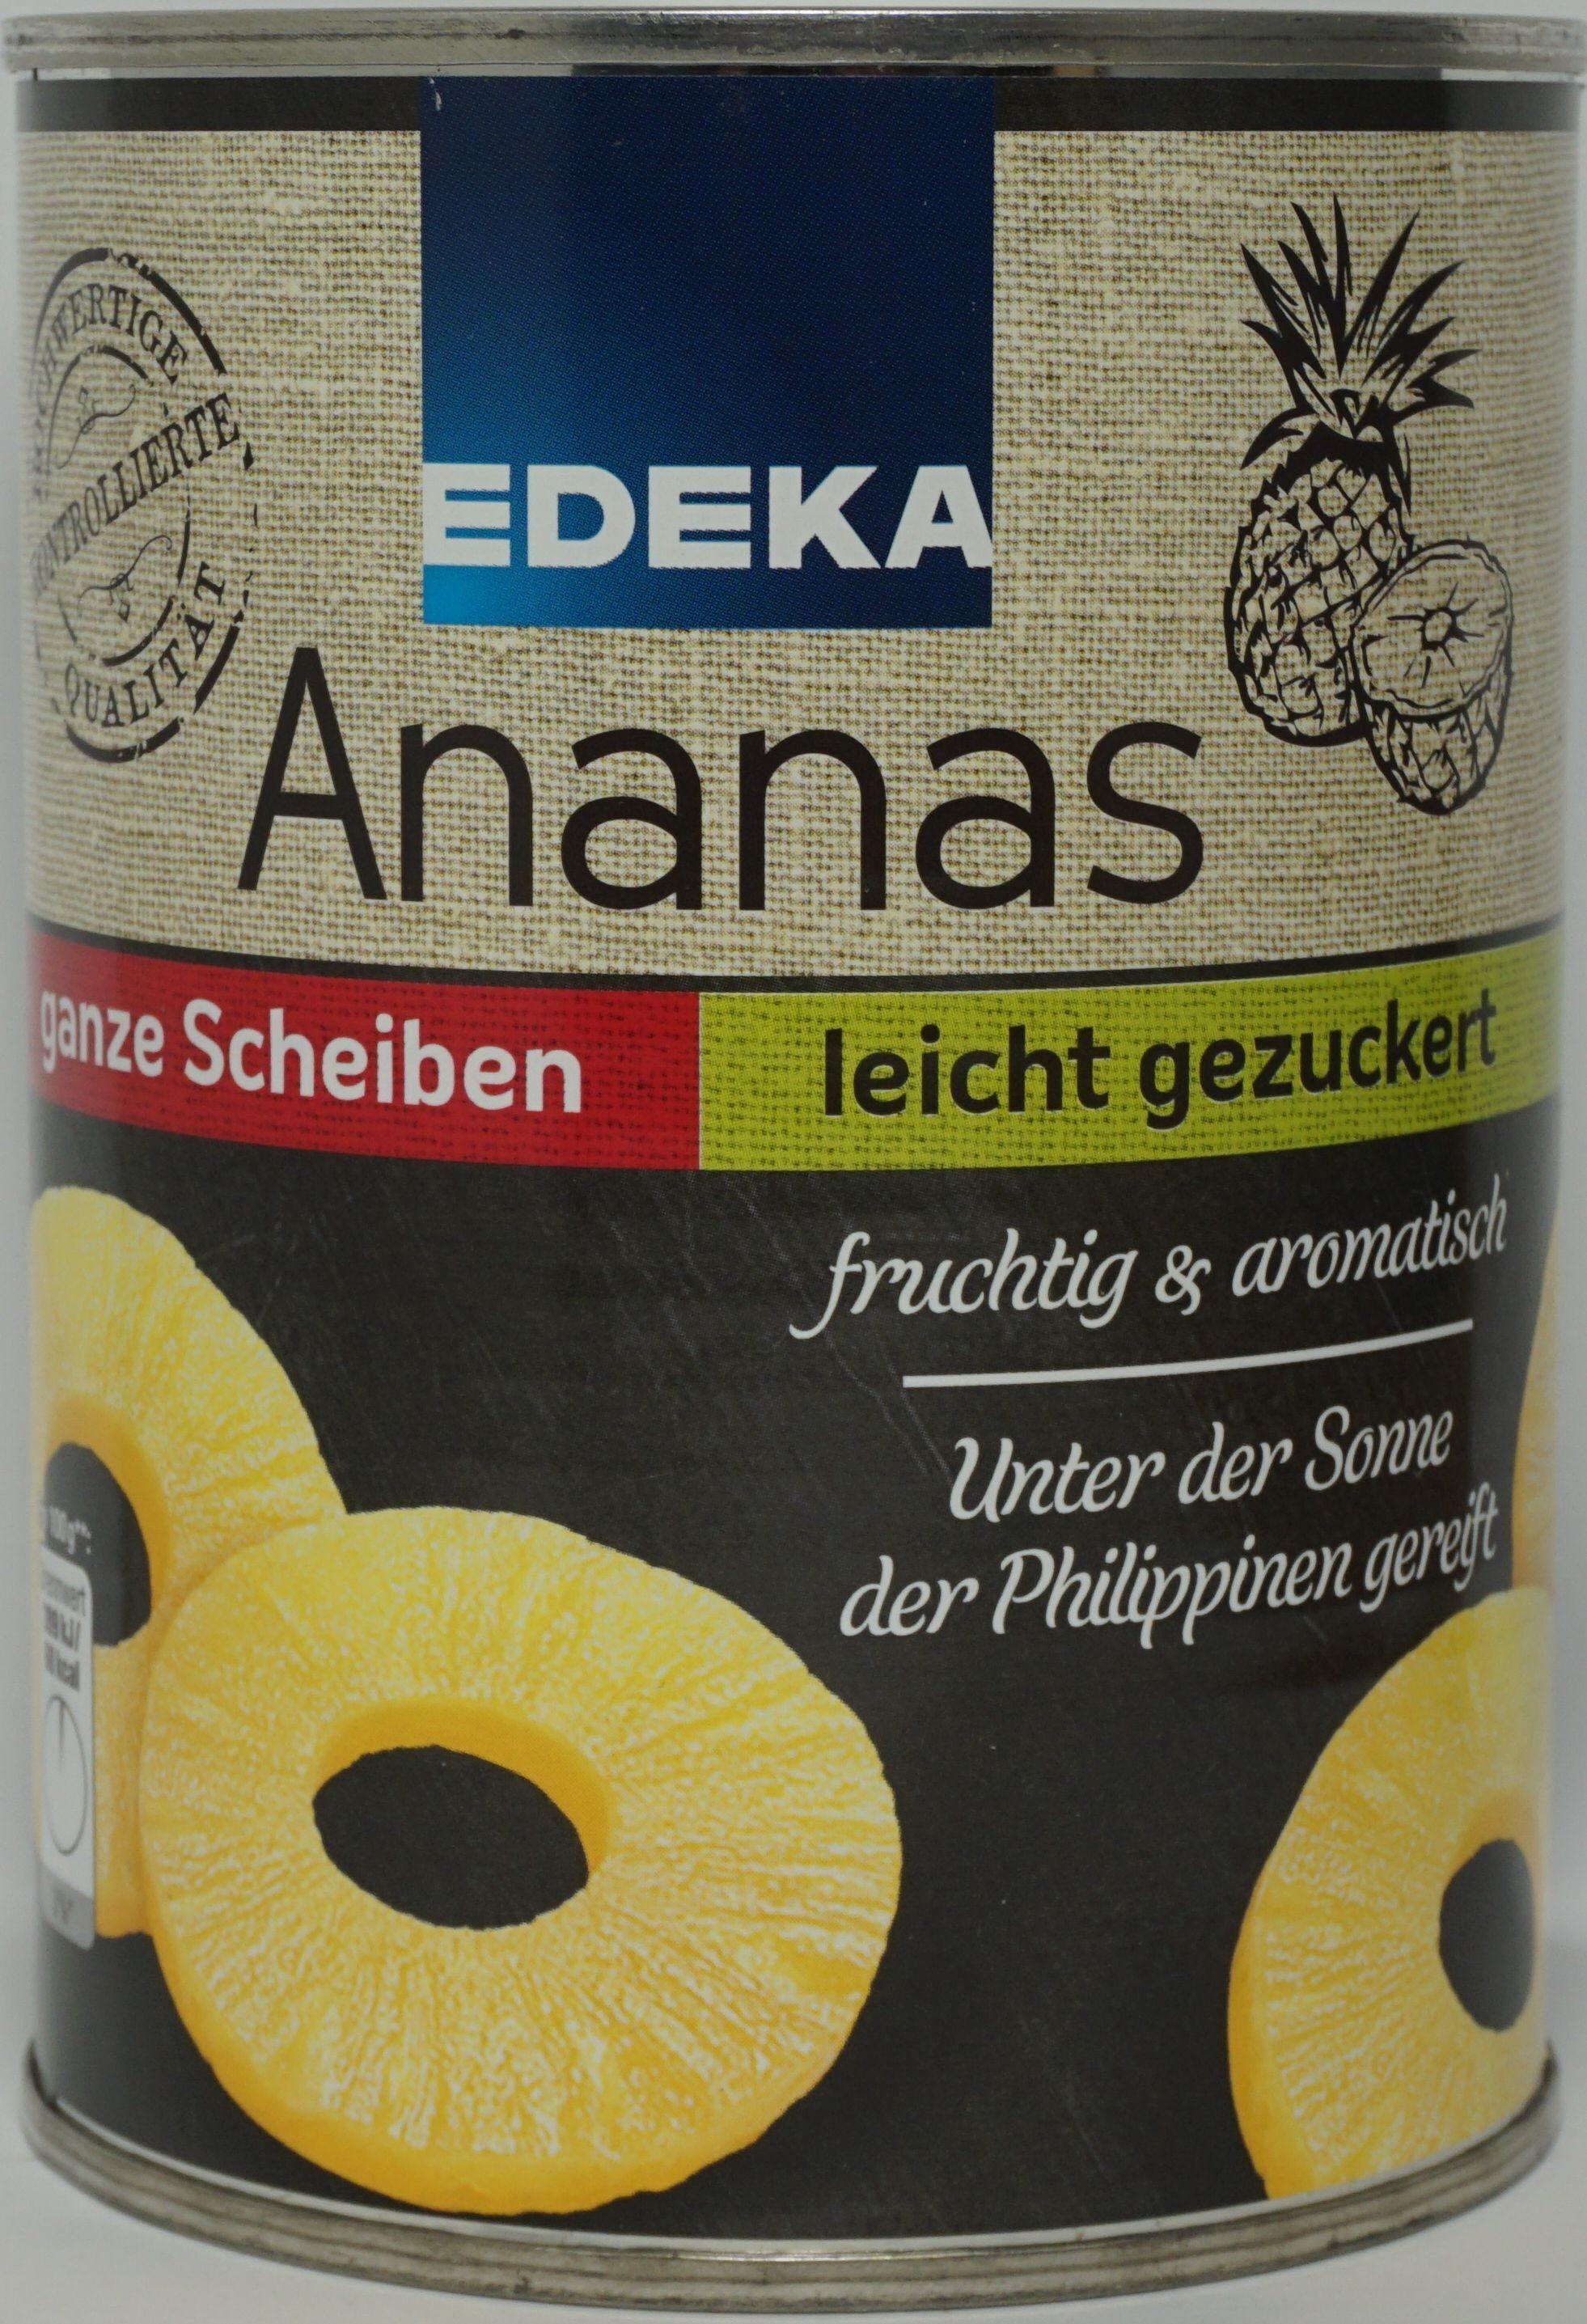 Ananas, ganze Scheiben, leicht gezuckert - Produkt - de